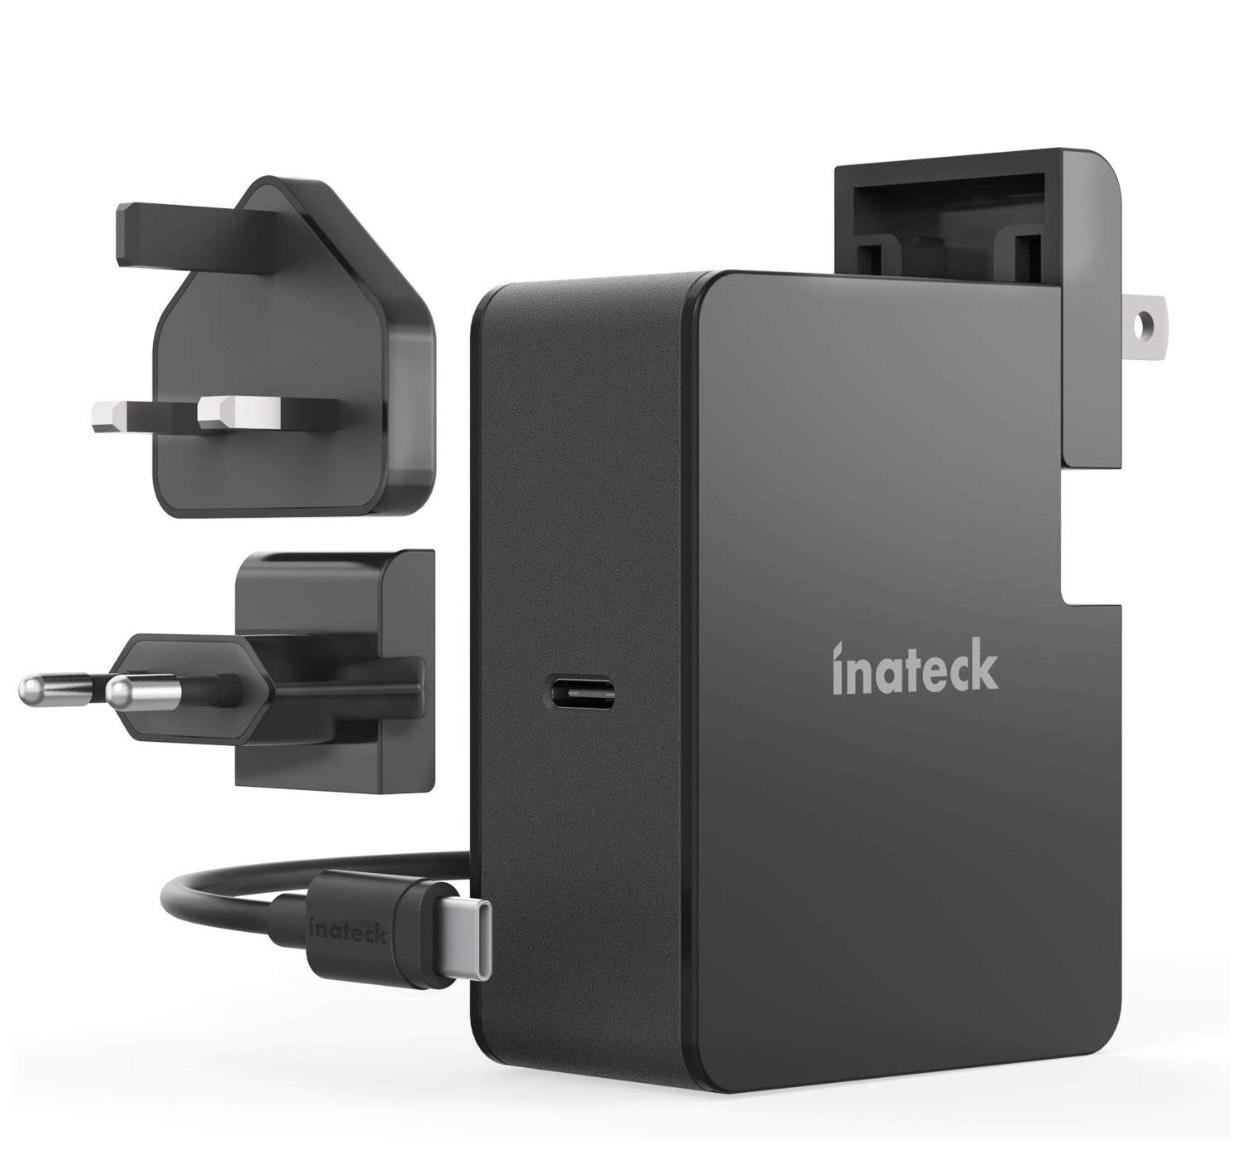 Inateck 45W USB C Ladegerät mit 2 m USB C Kabel, Power Delivery Type C